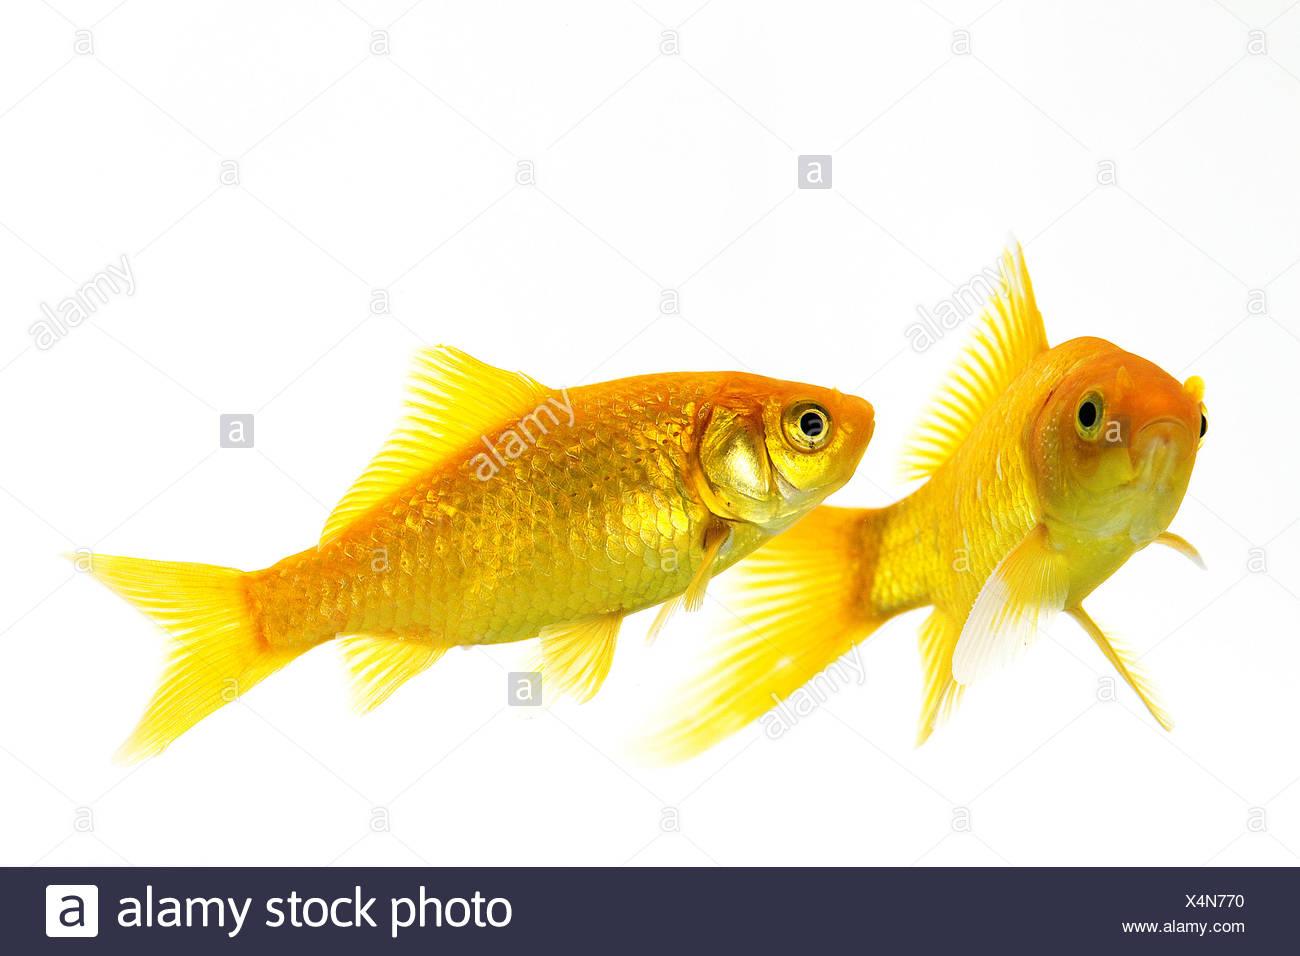 Goldfish, carassius auratus, Adults Against White Background Stock Photo